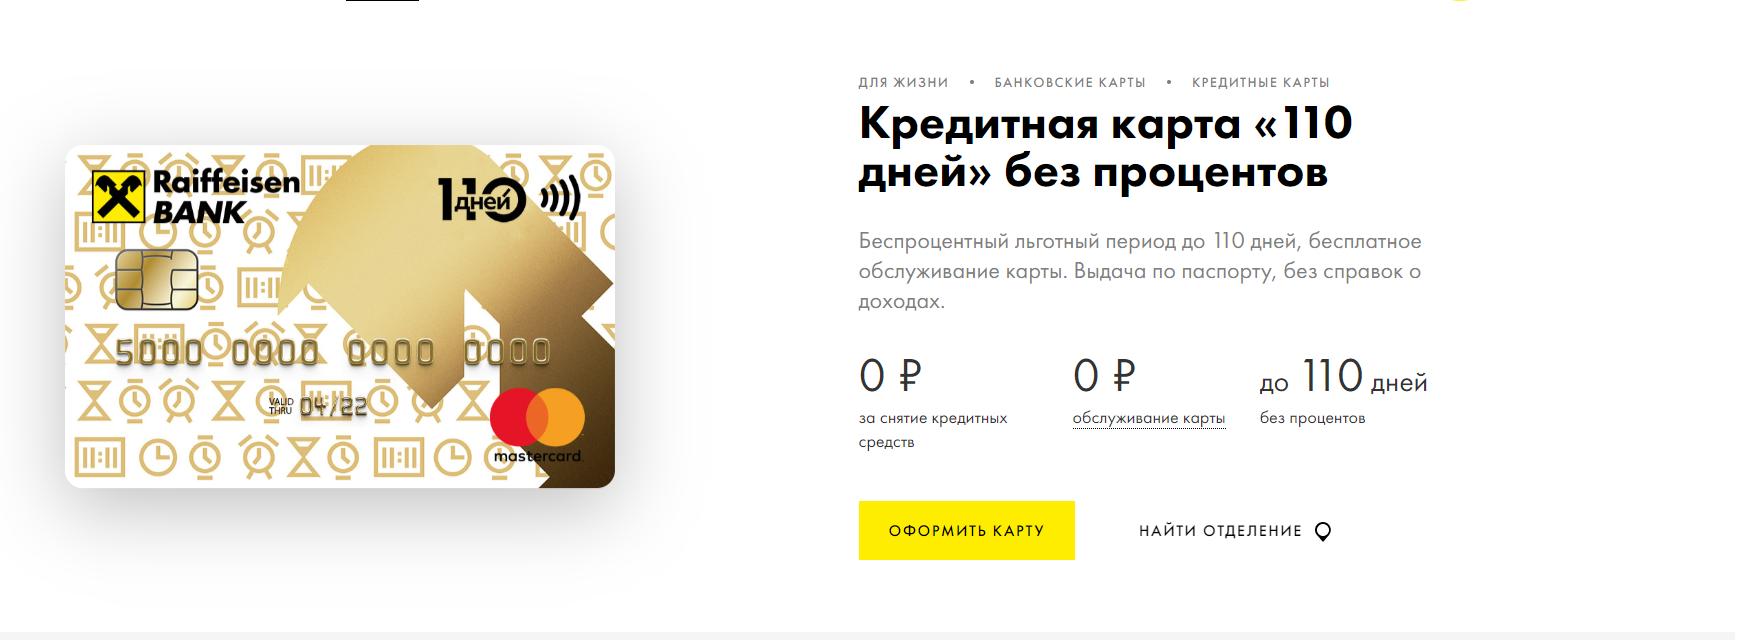 kreditnaya-karta-rajffajzenbank-110-dnej-otzyvy_